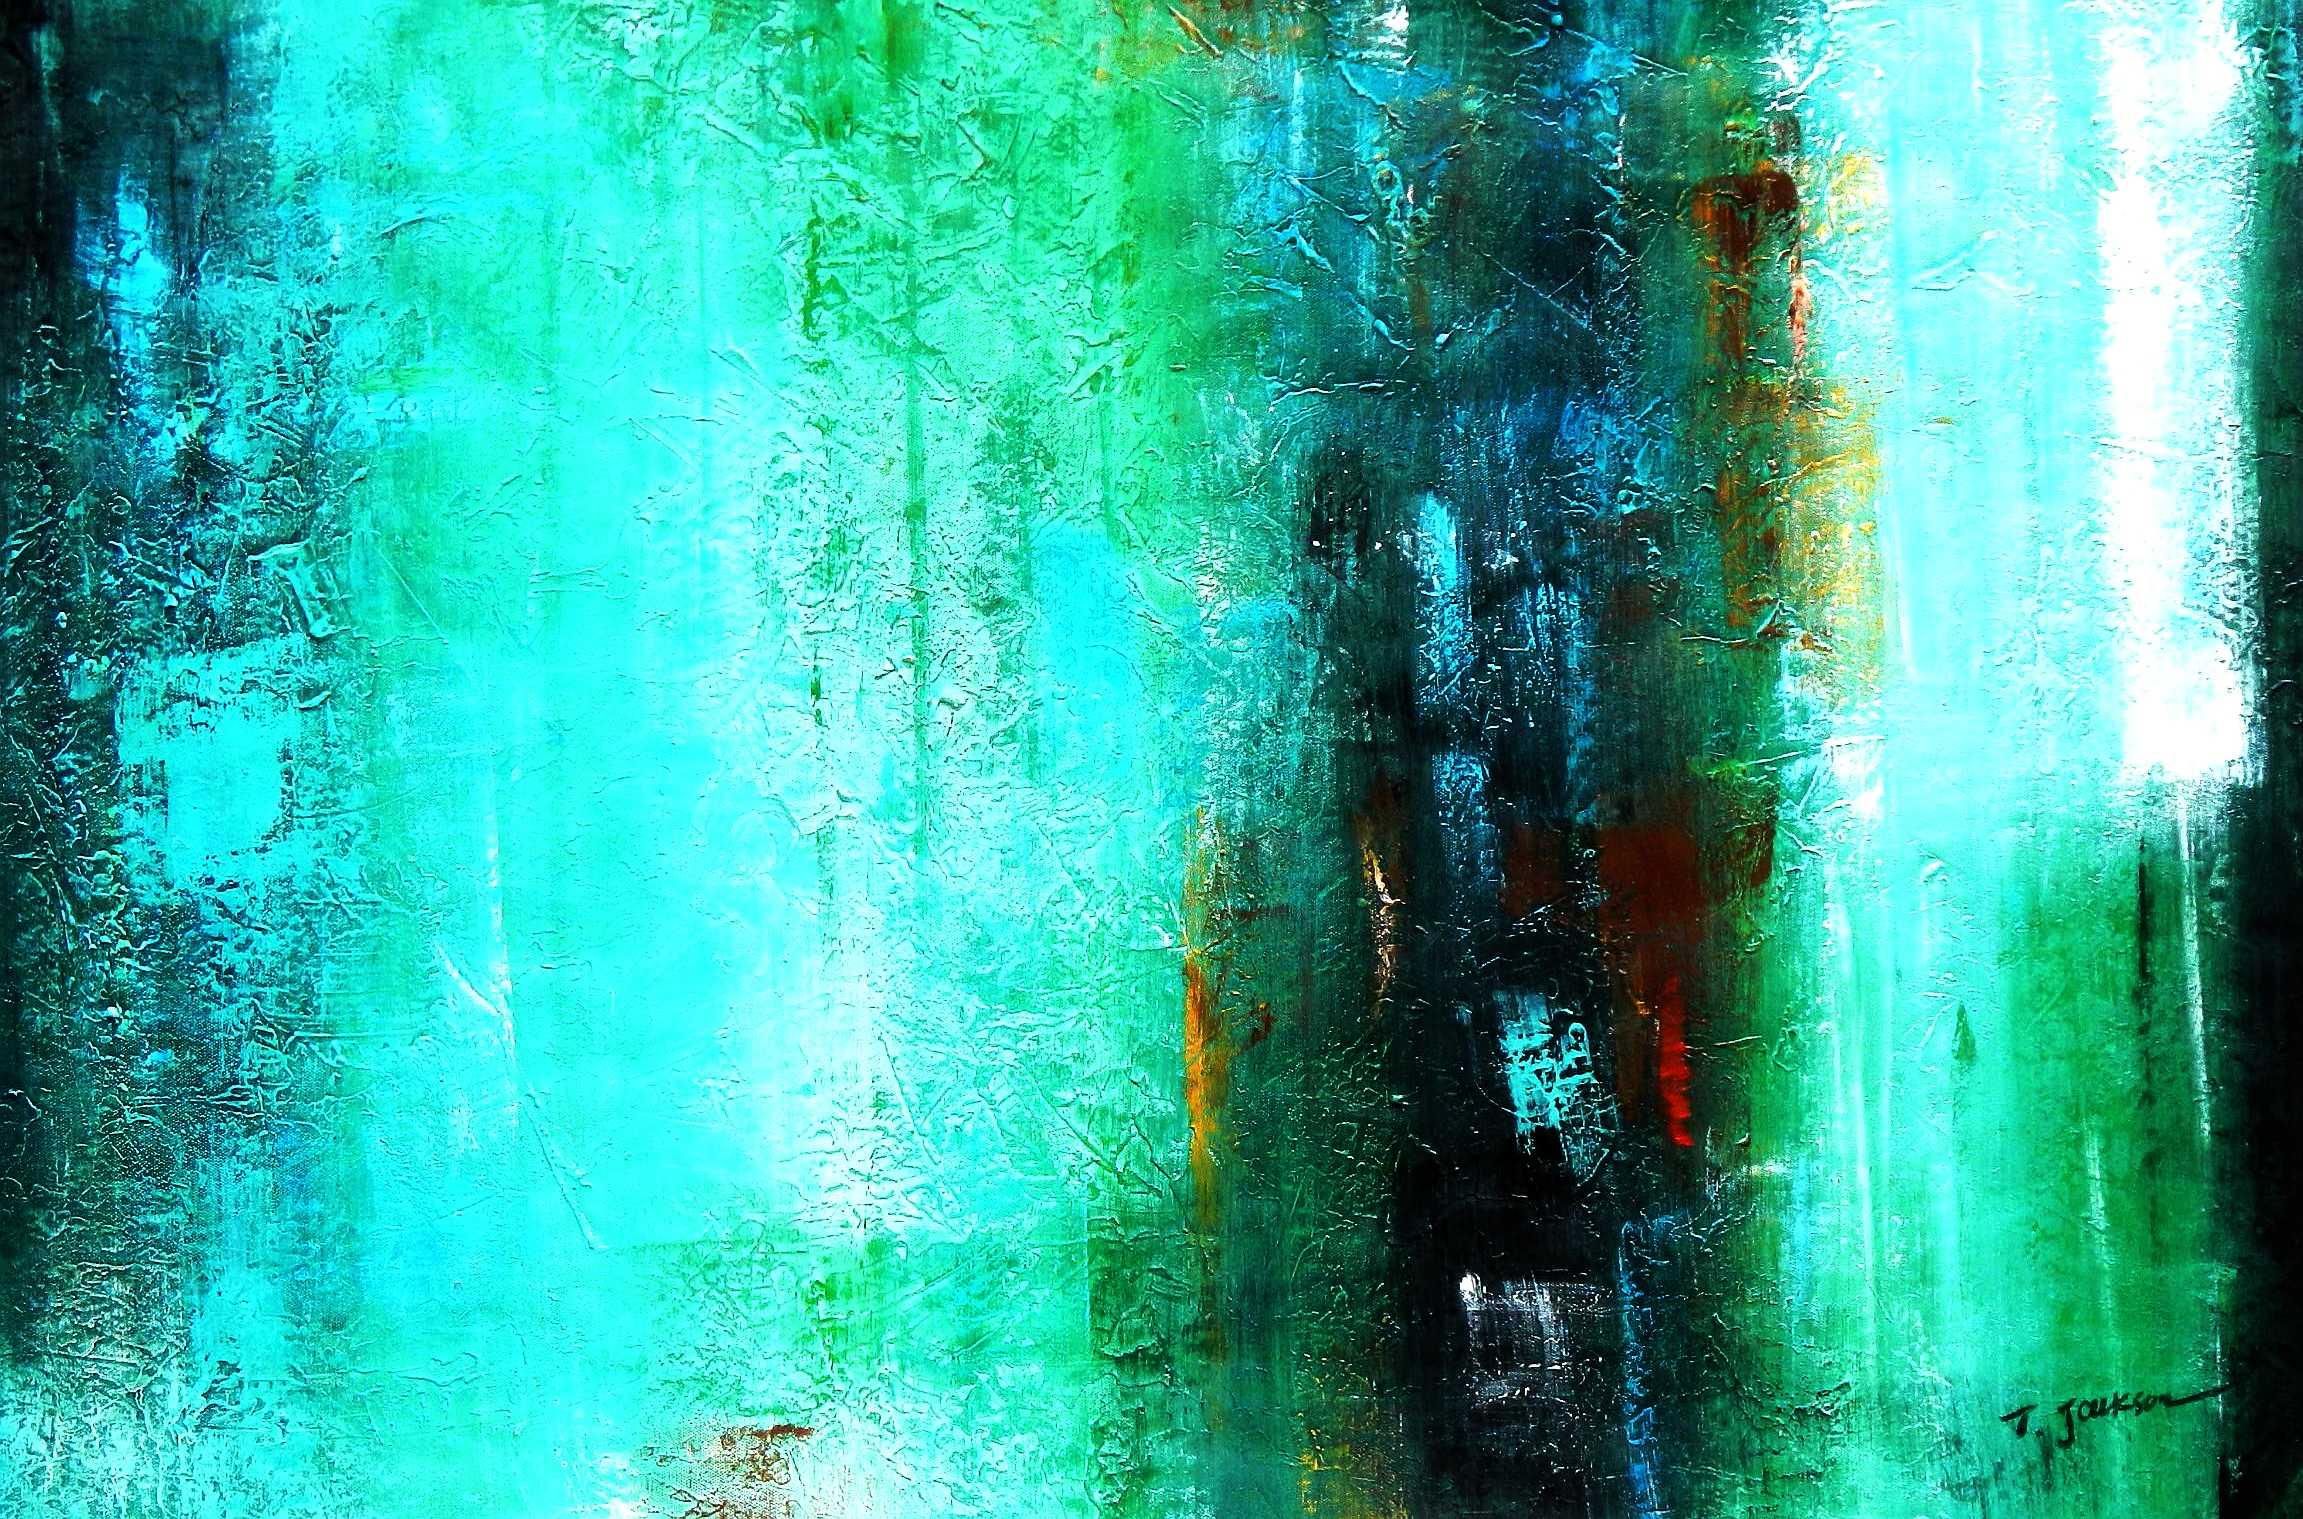 Abstract - Ireland Summer games d95834 60x90cm abstraktes Gemälde